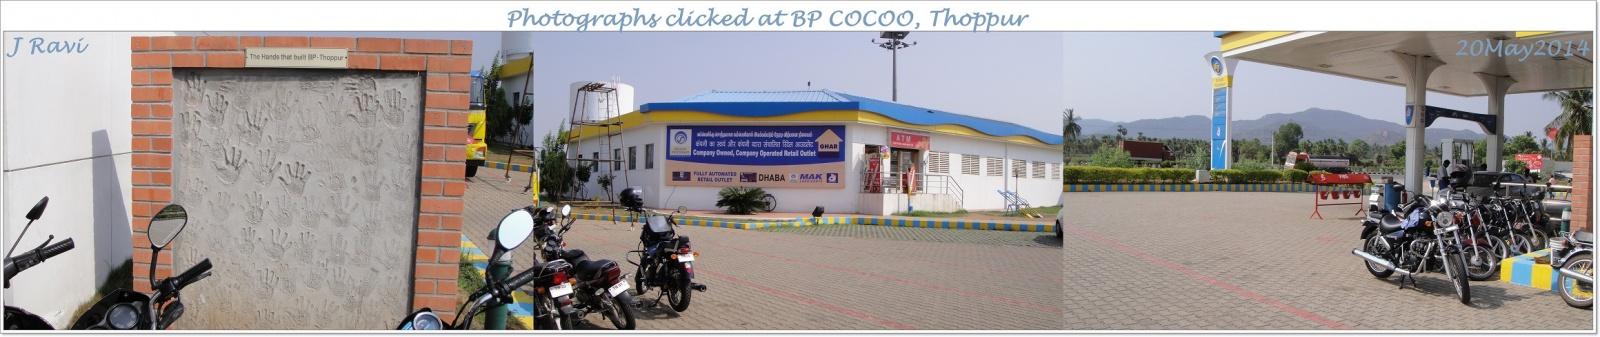 BPThoppur.jpg